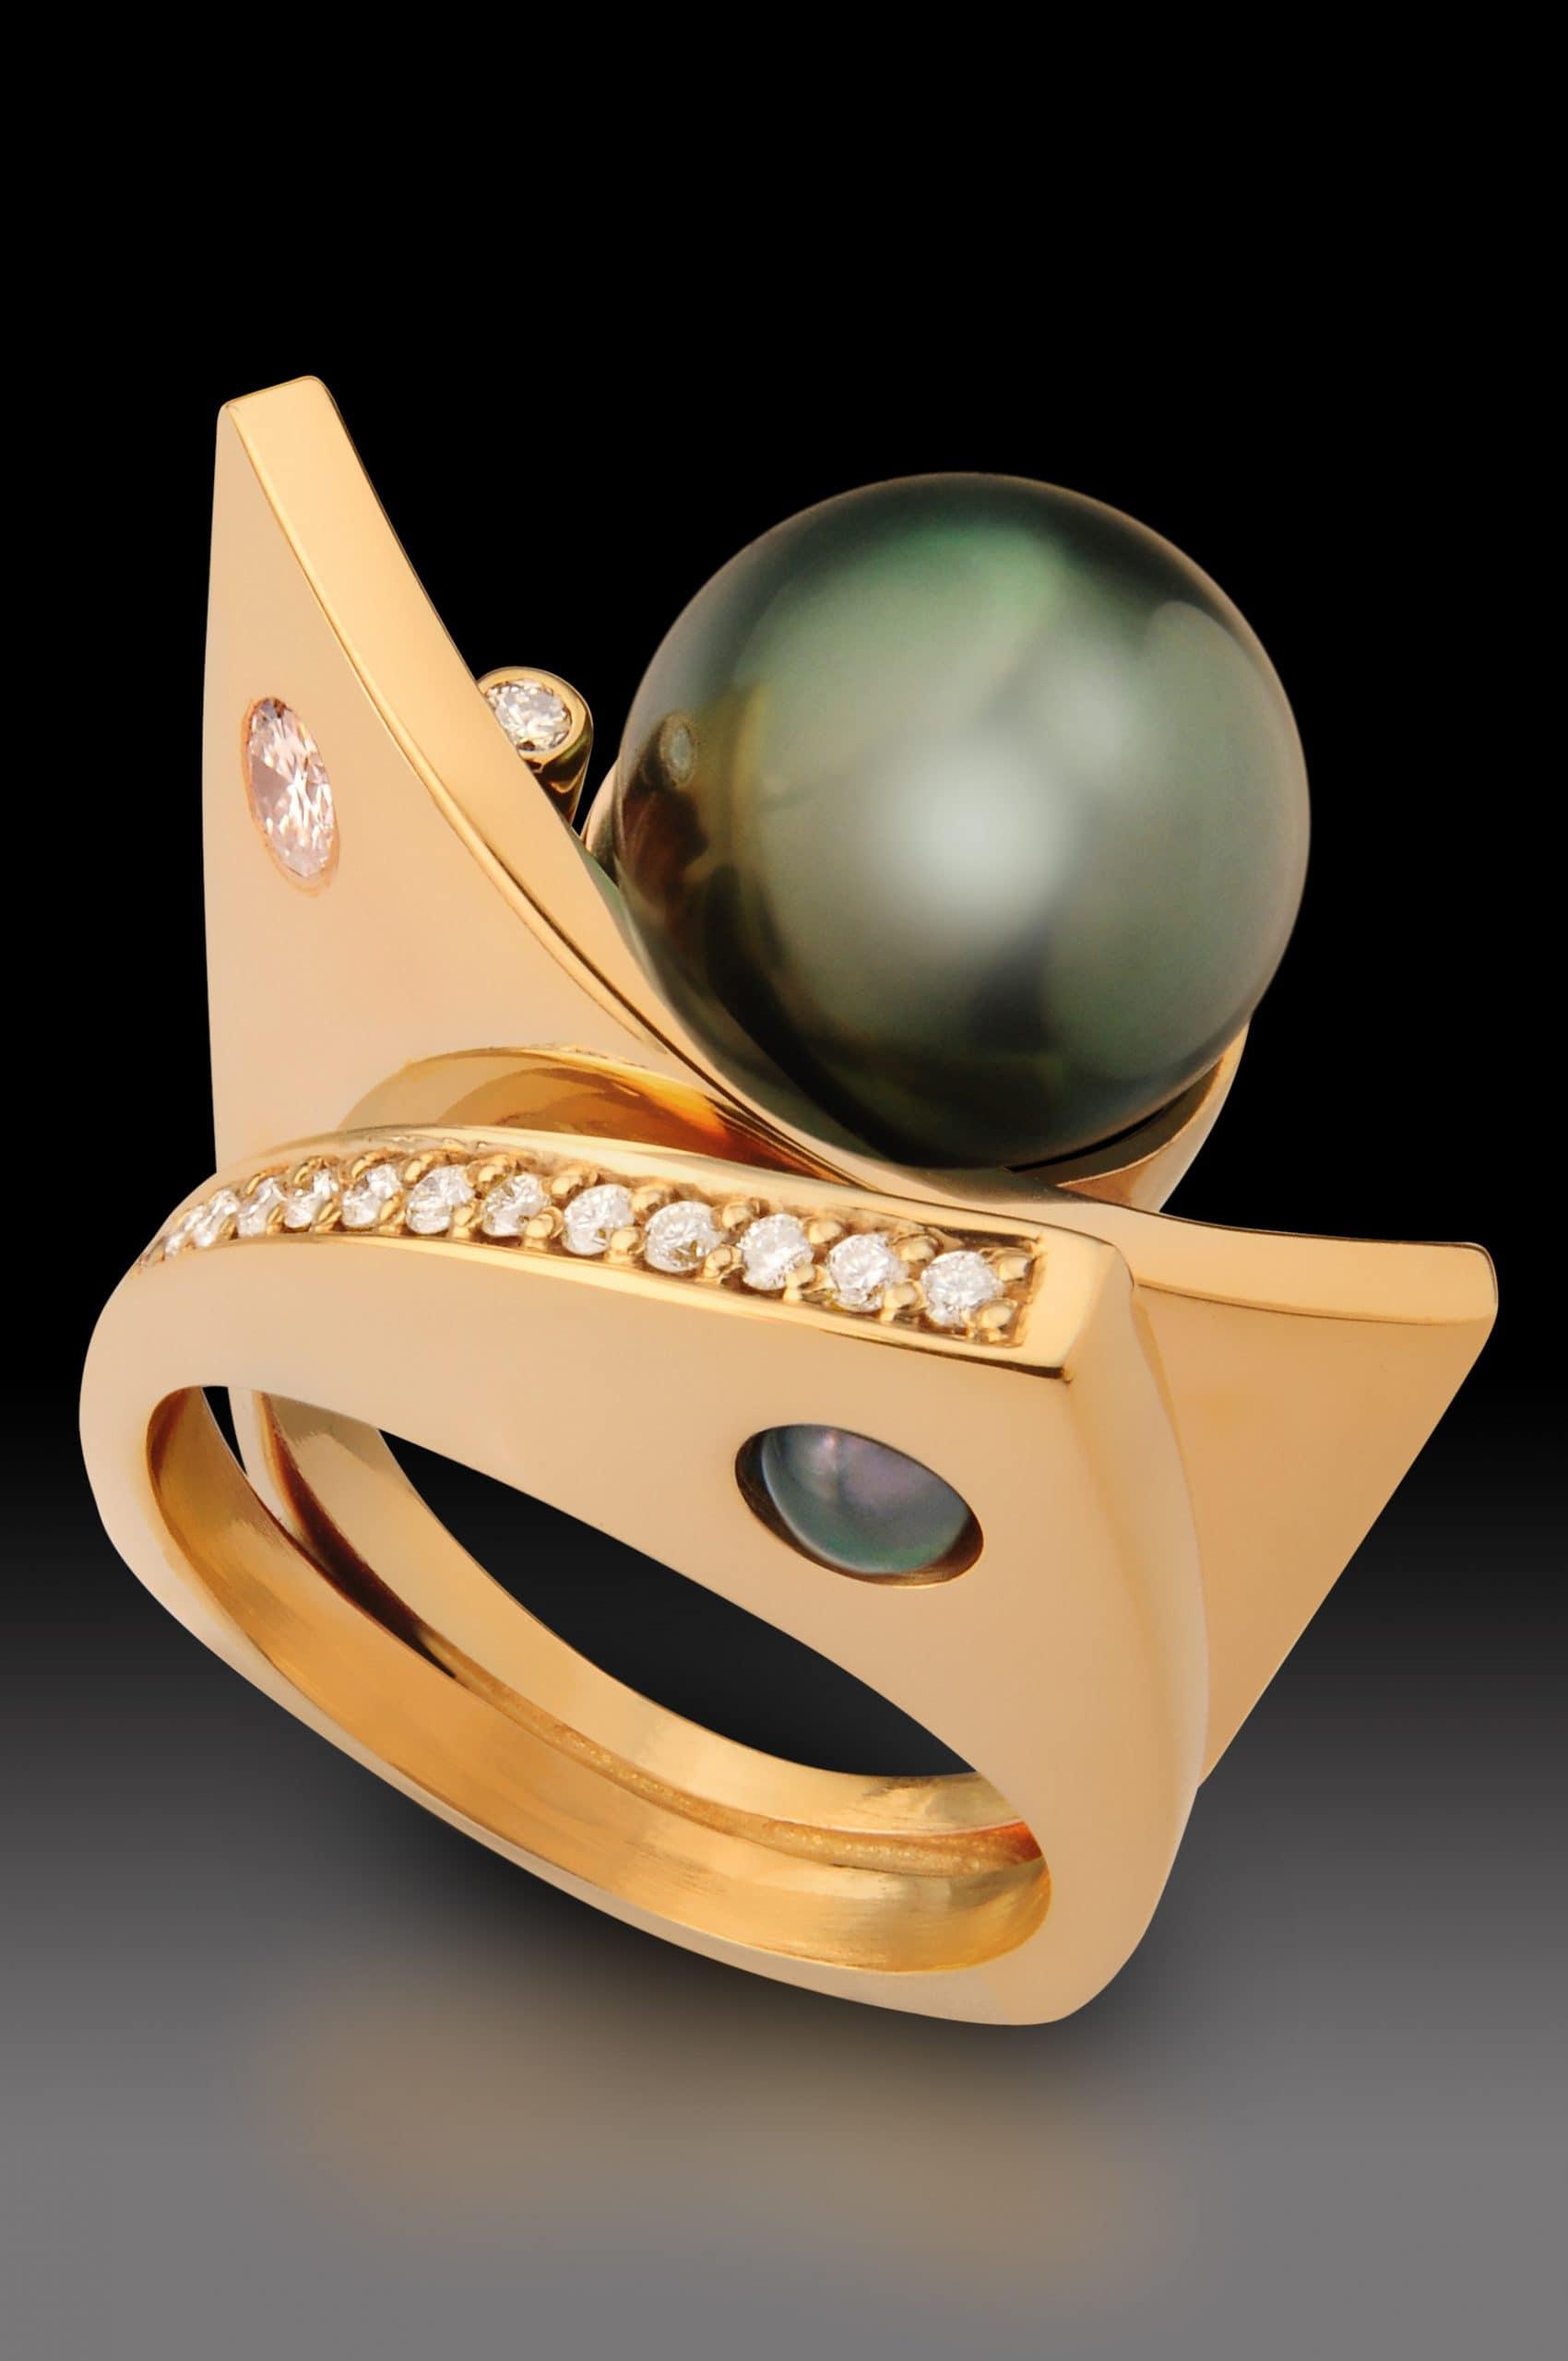 Patricio-Ferreira-Designs-Fine-Art-Jewelry jpg